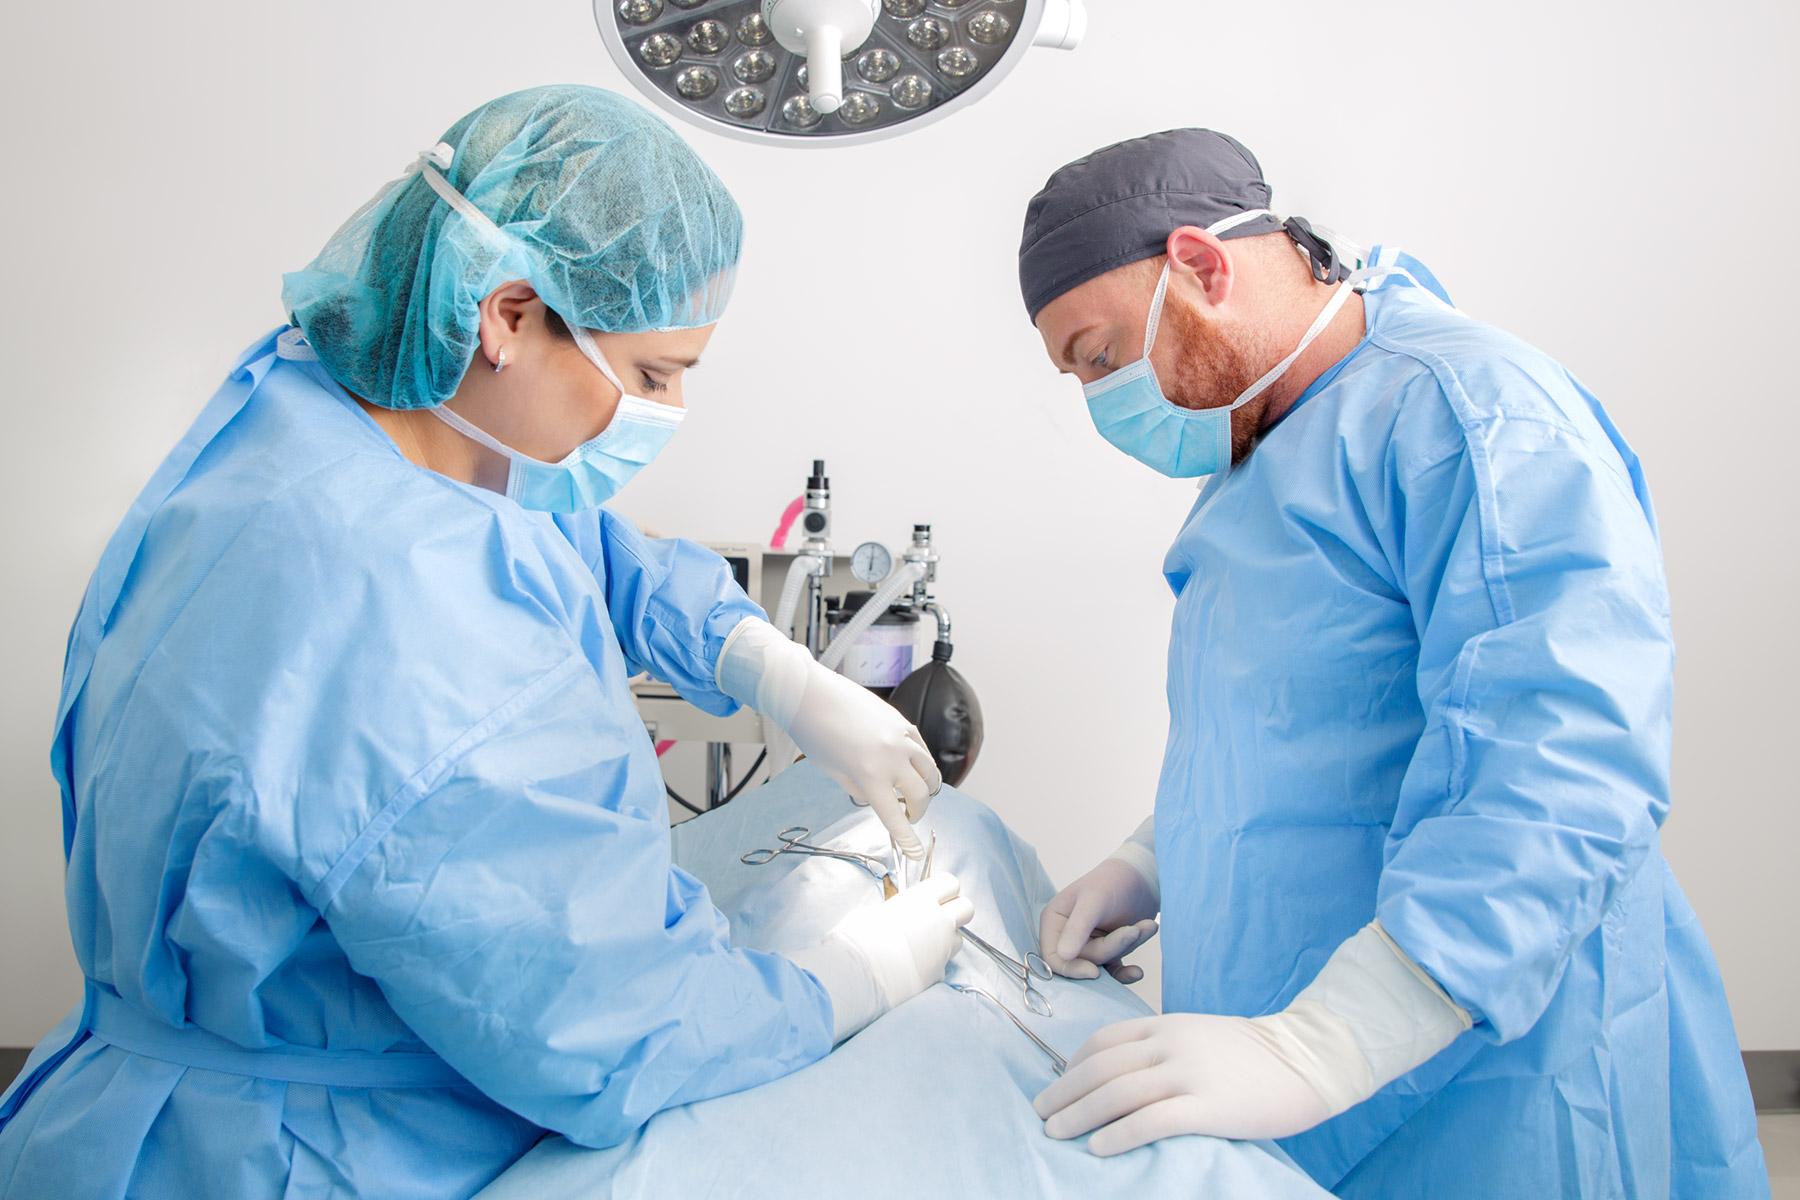 miami_lifestyle_photographer_david_gonzalez_photography_environmental_portrait_miami_photo_medical_healthcare_advertising_vet_surgery.jpg